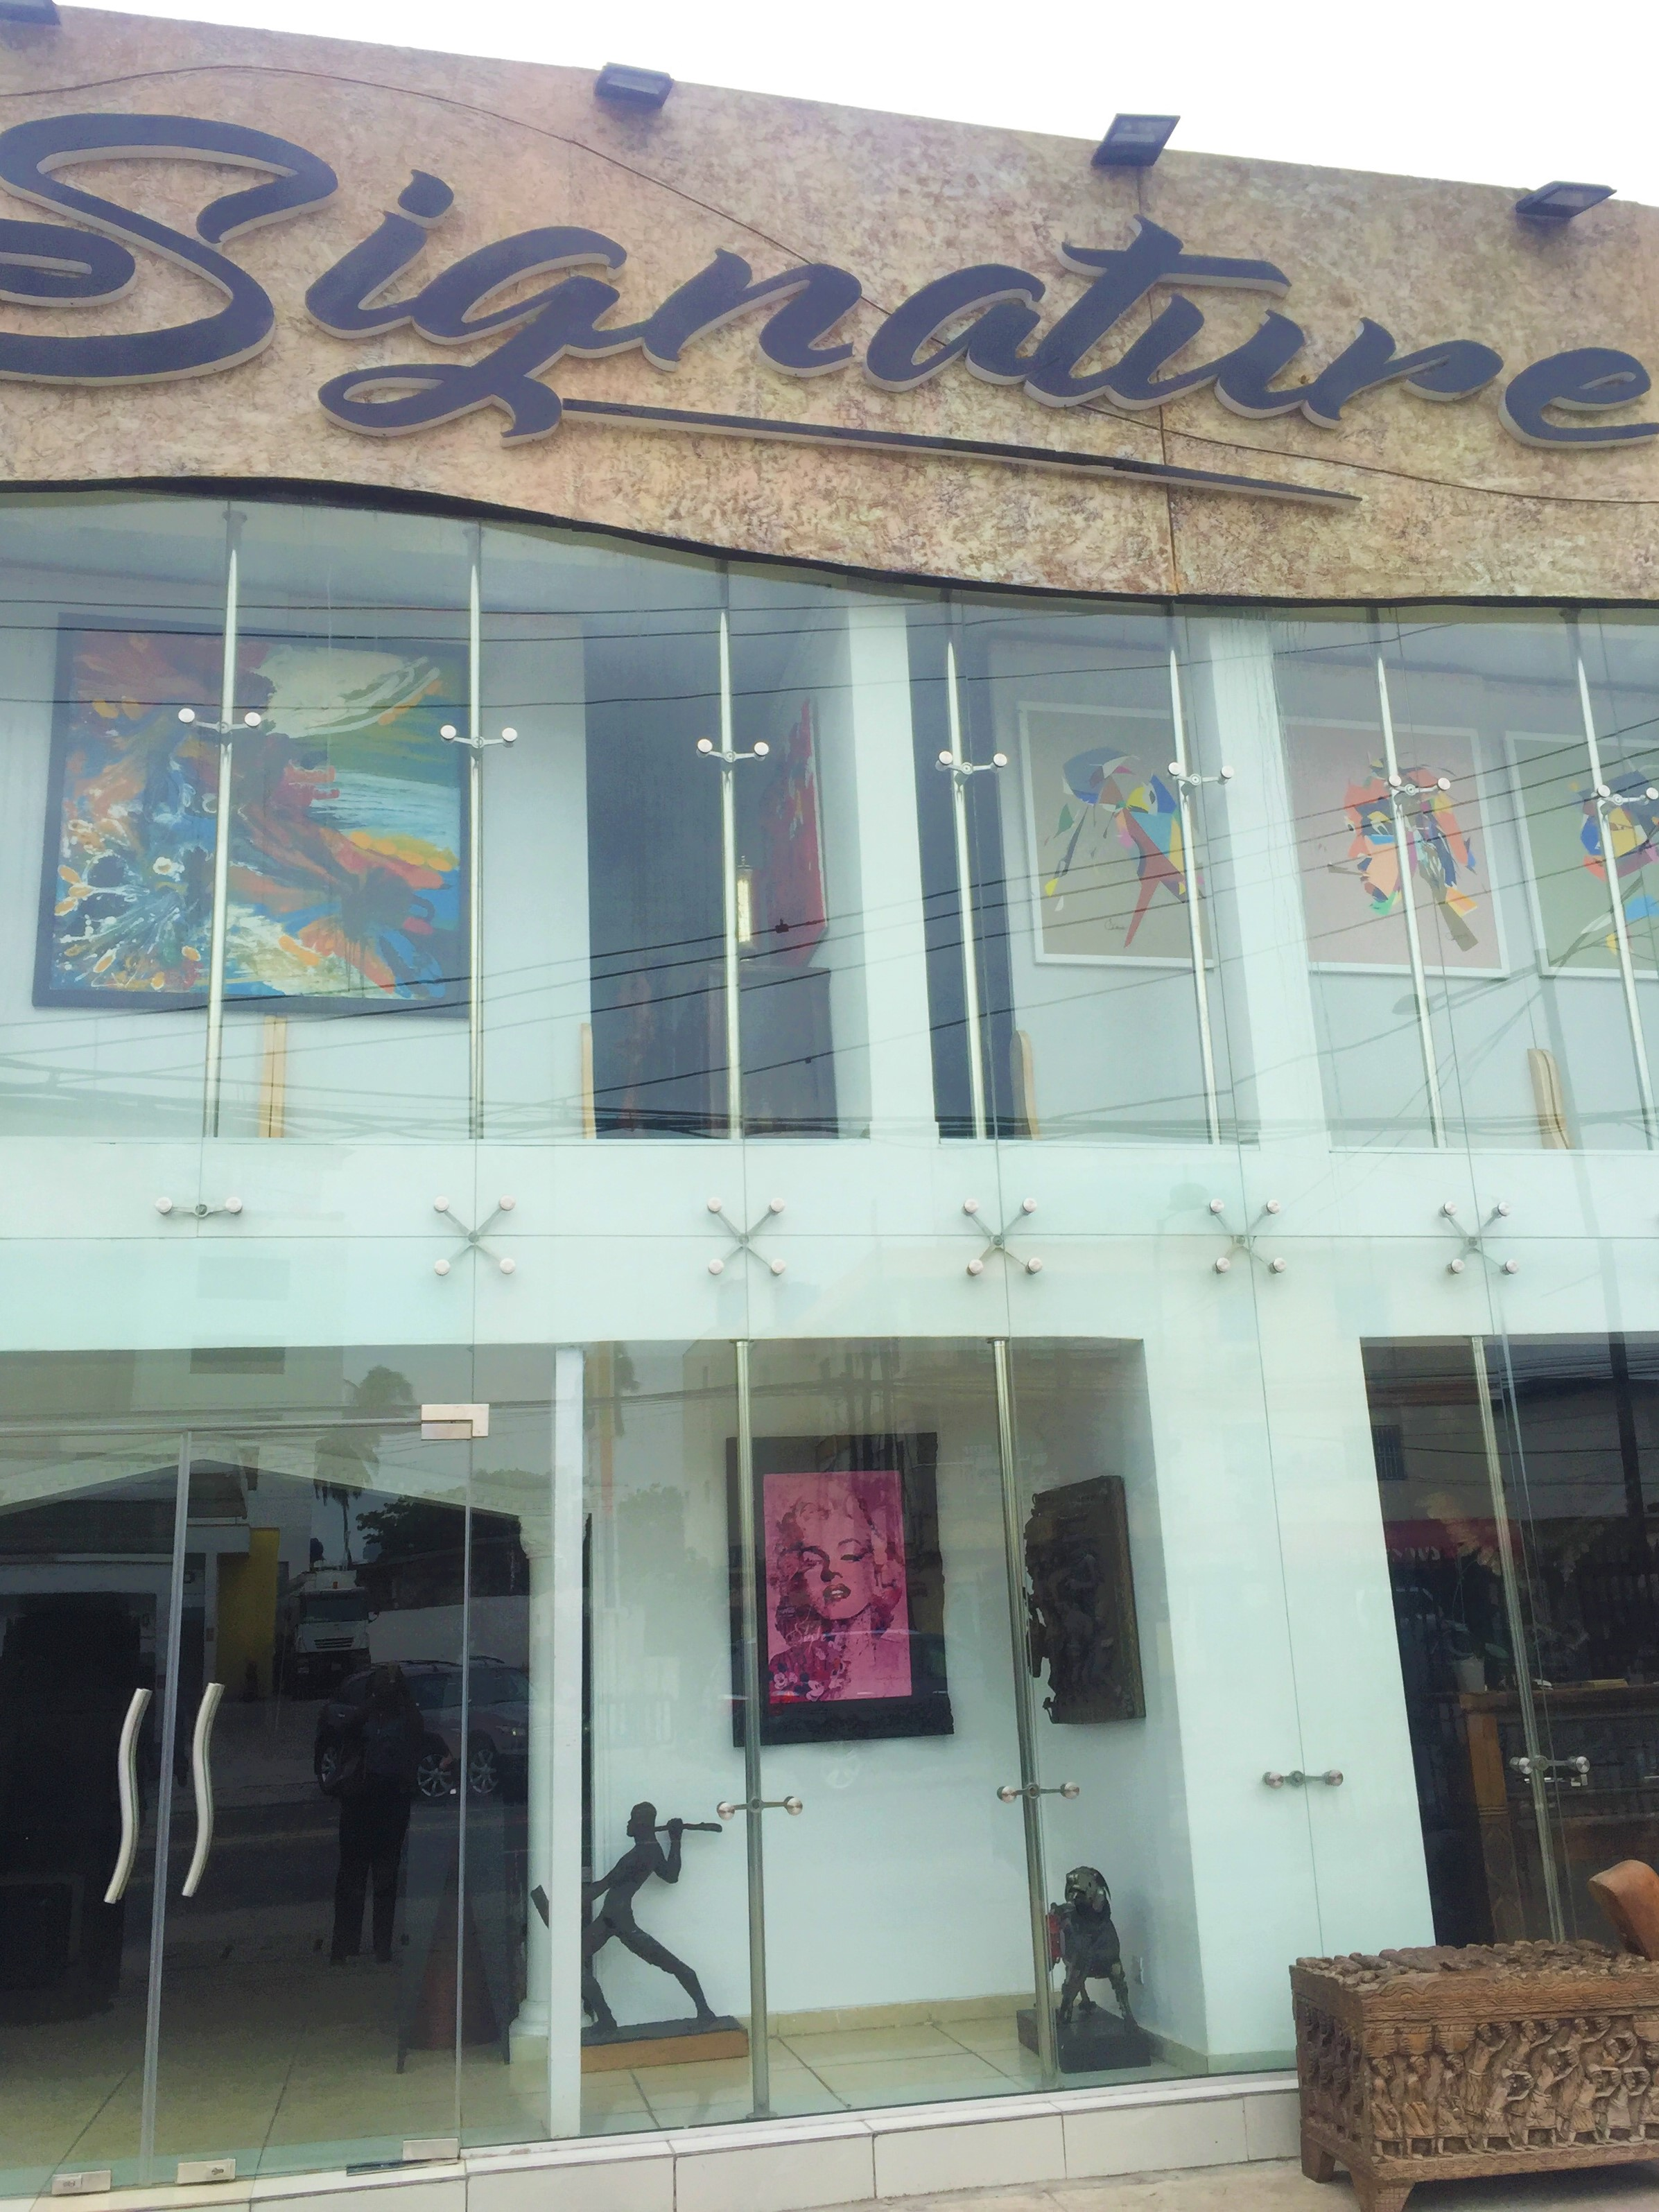 Signature-beyond art Gallery   The Ajala Bug